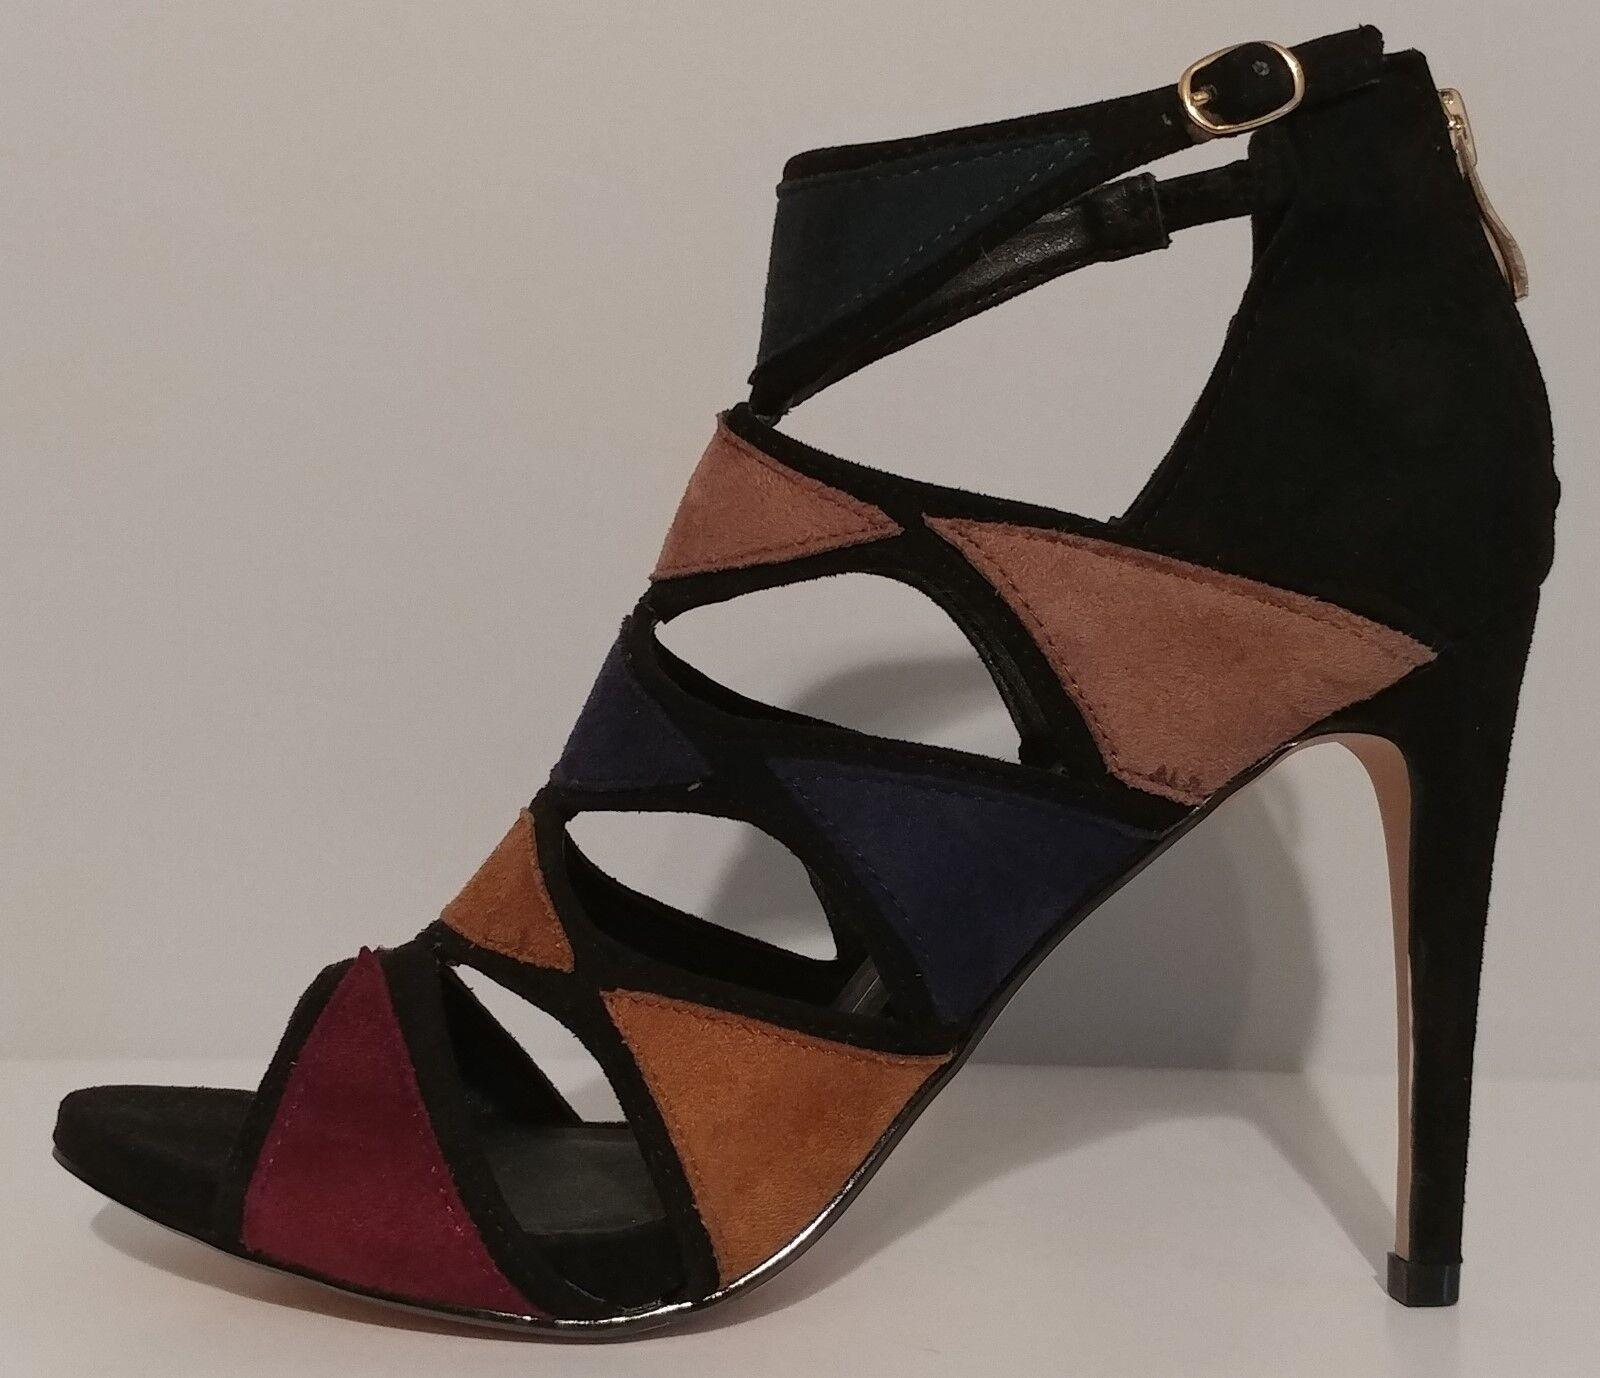 NEW   XOXO Multi color Suede Sandals 4  Heels Size 8.5M US 38.5M EUR